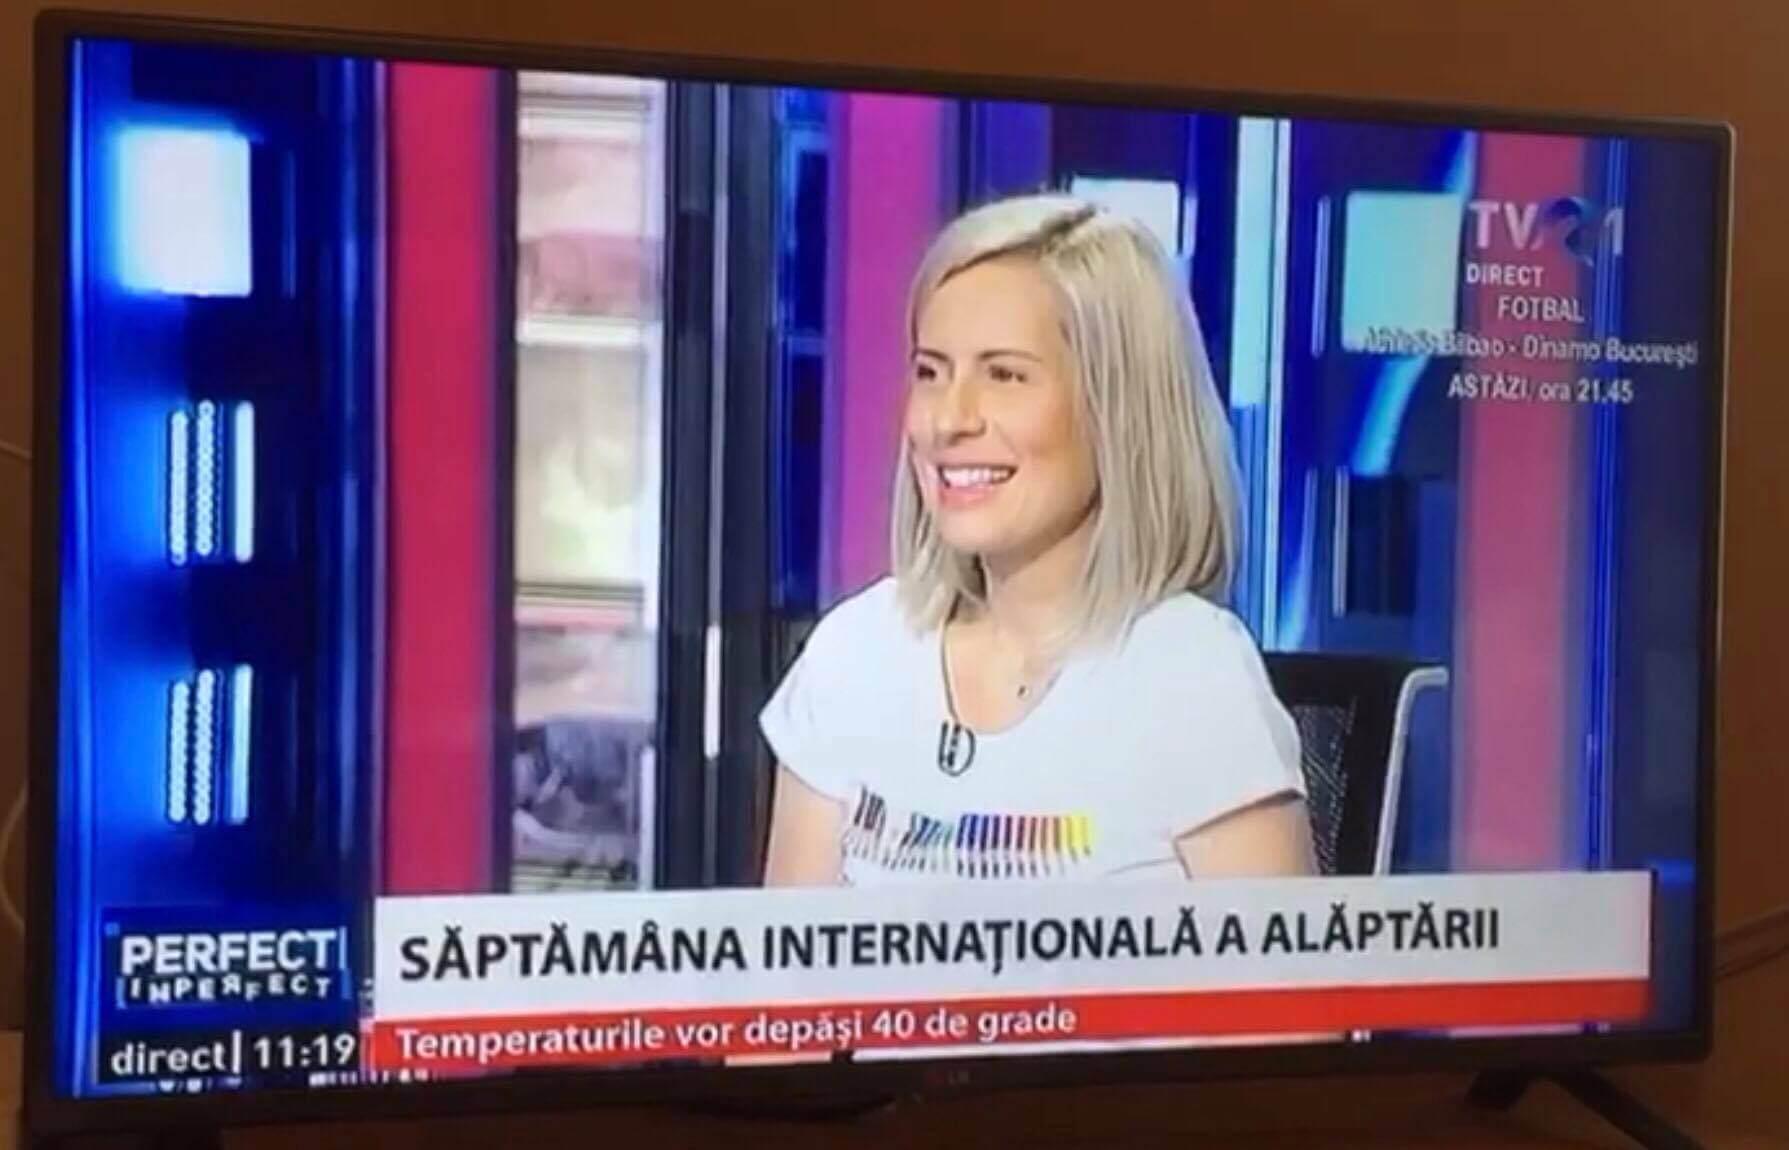 Miruna Ioani - Sustine alaptatul in public la TVR1